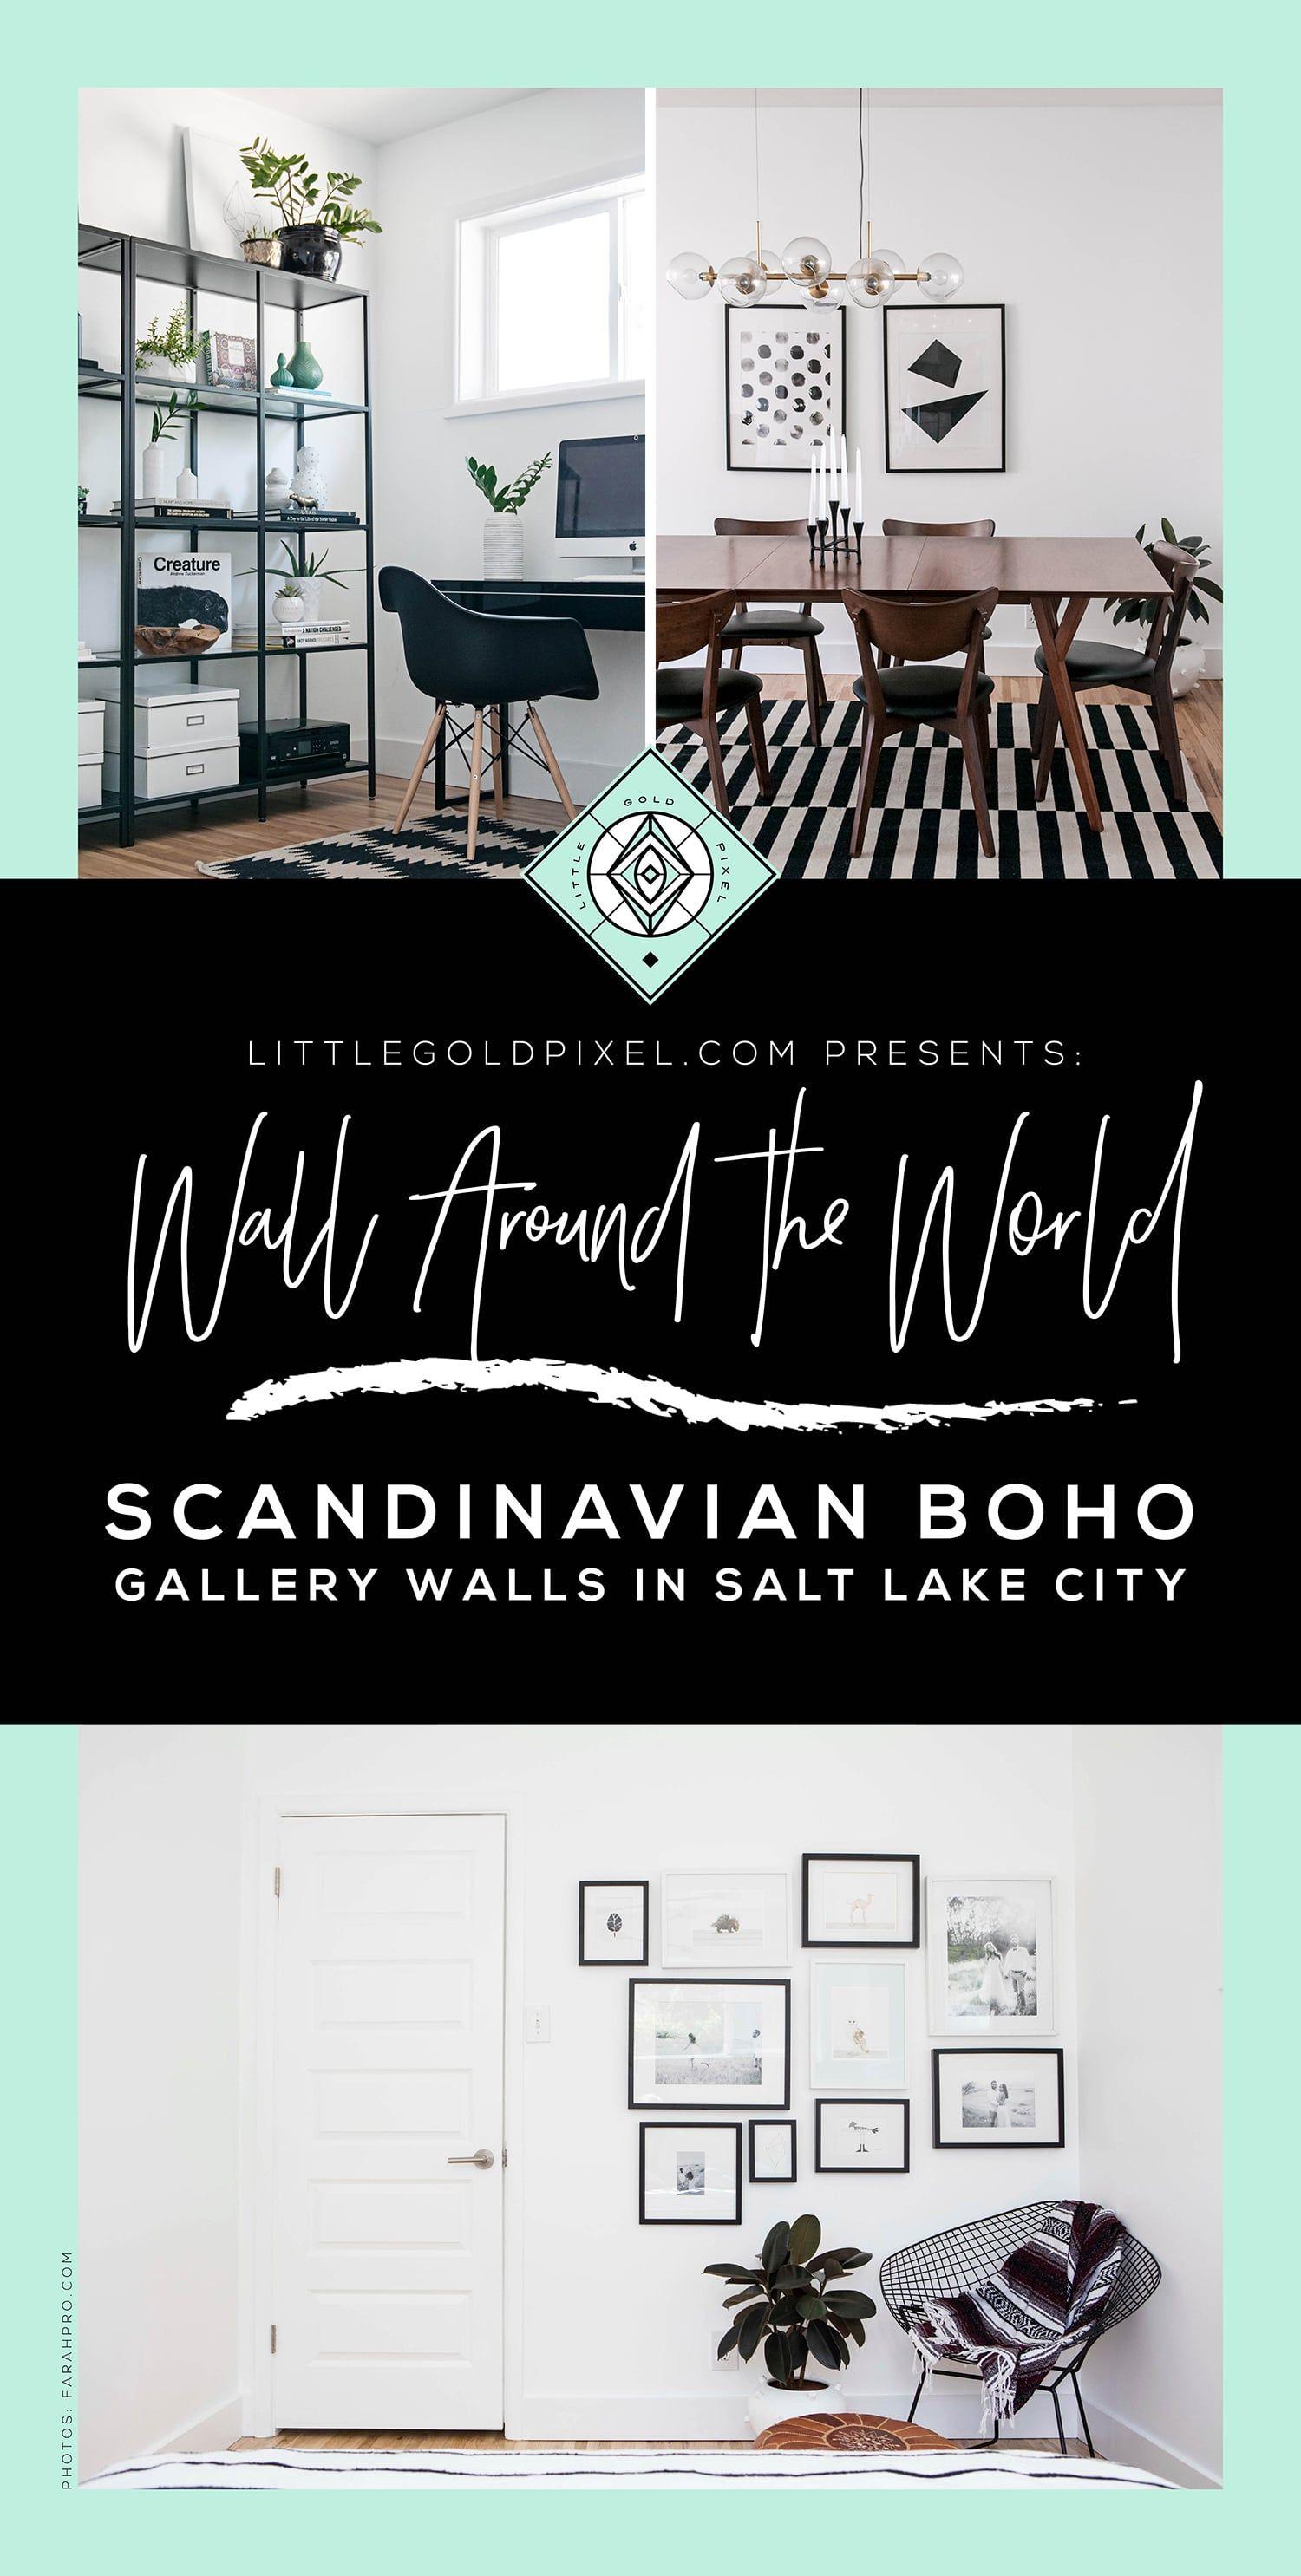 Scandinavian Boho Gallery Walls U2022 Home Tour